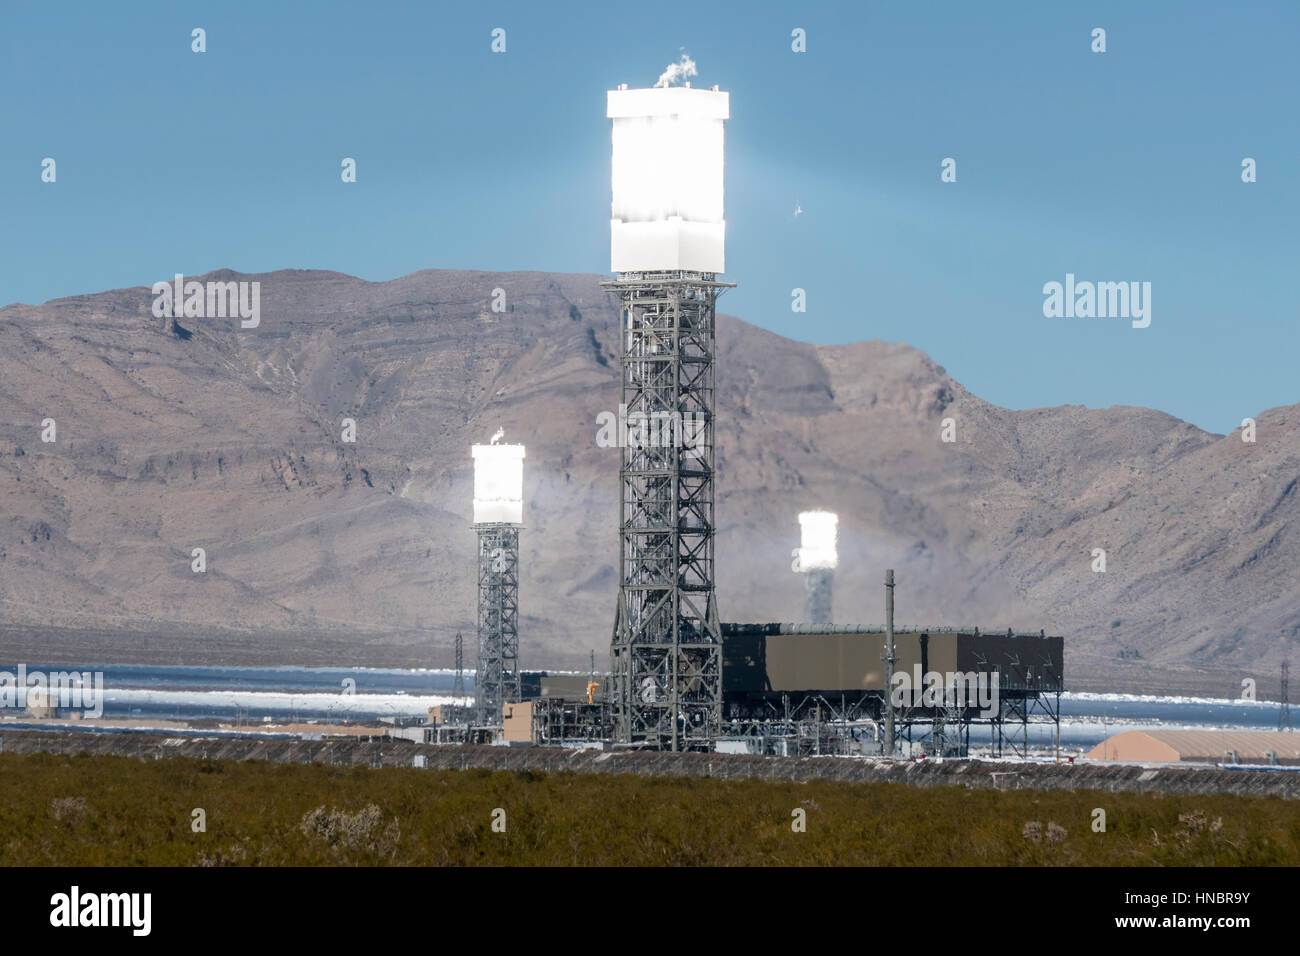 Ivanpah, California, USA - November 26, 2014:  Focused mirrors producing intense heat shimmers at the massive 392 - Stock Image